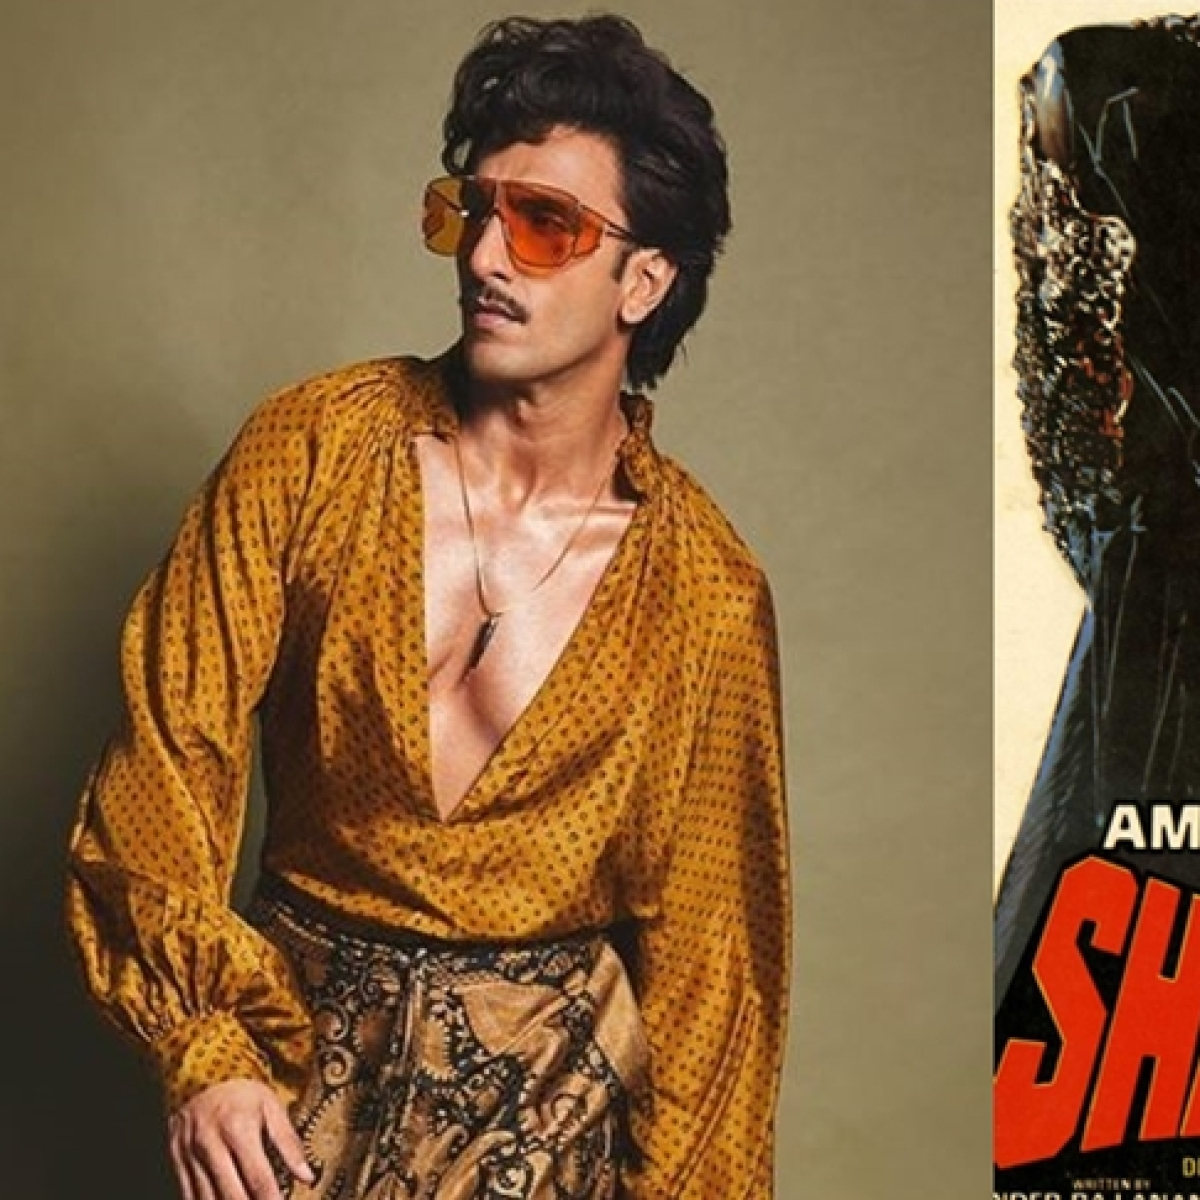 Amitabh Bachchan's 'Shahenshah' remake to feature Ranveer Singh as lead?